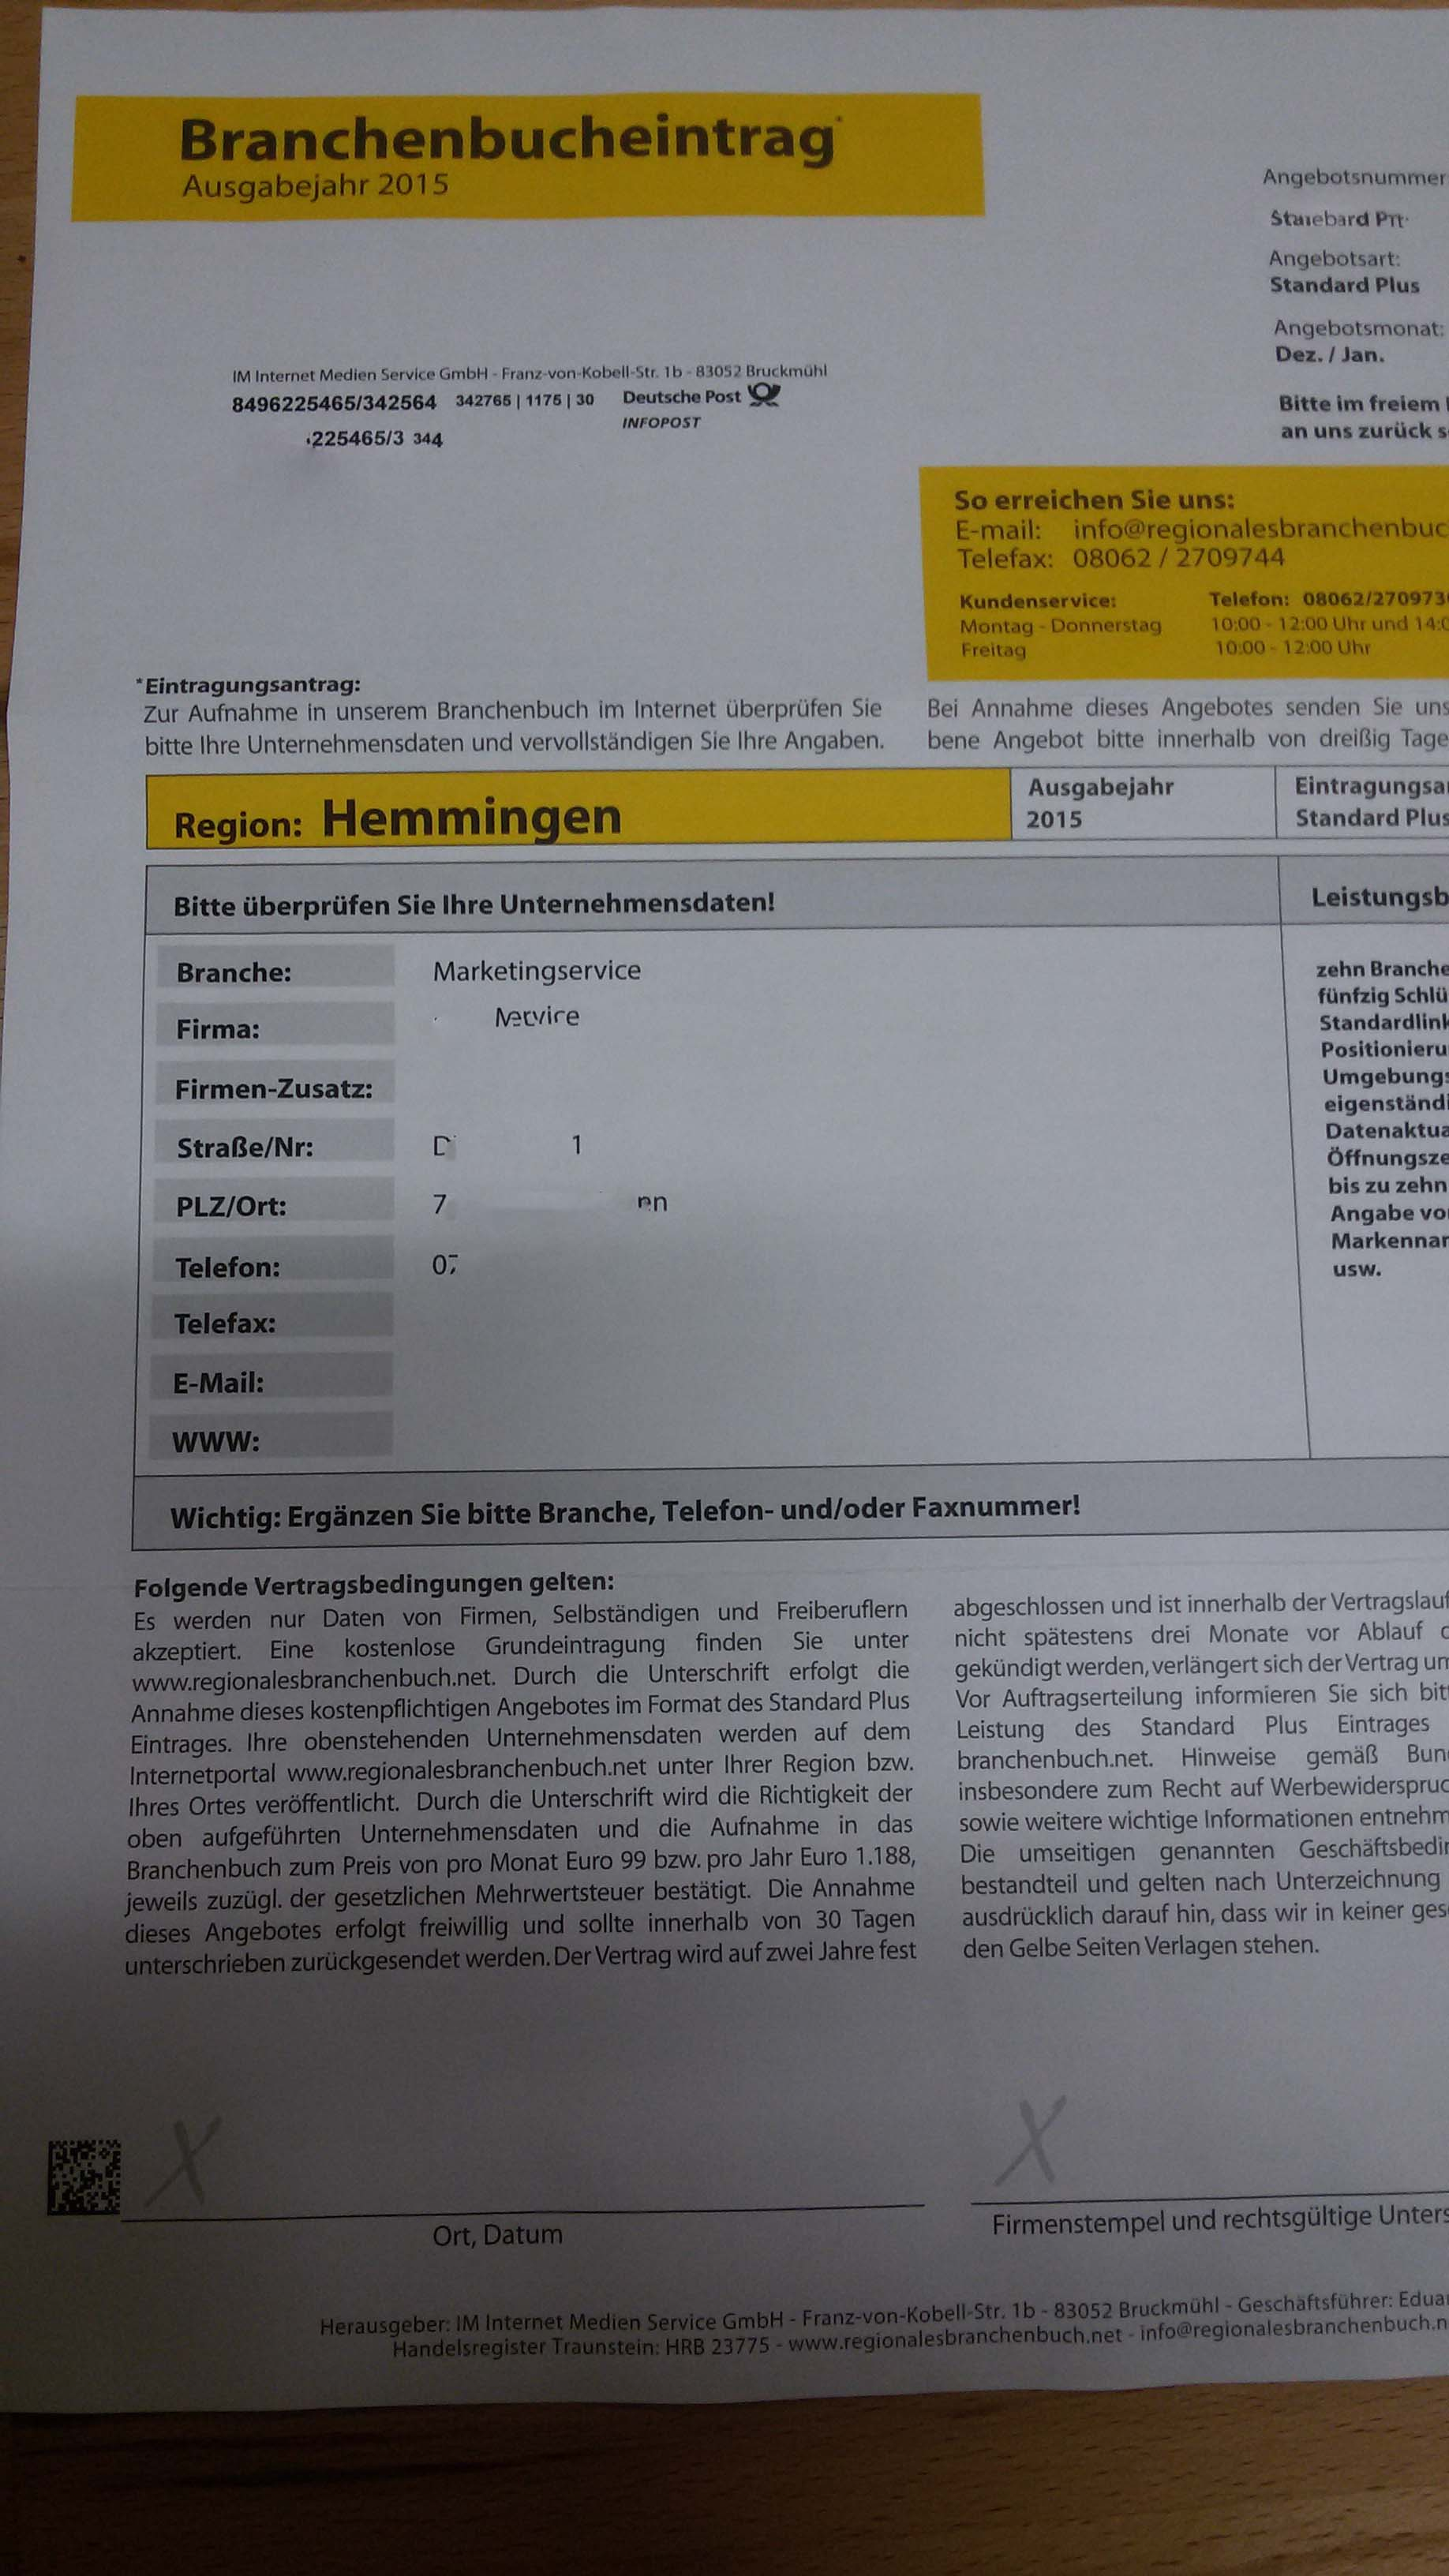 Abzocke Antivirus Netprom Info Zu Abzocke Abzocke Mit Viren